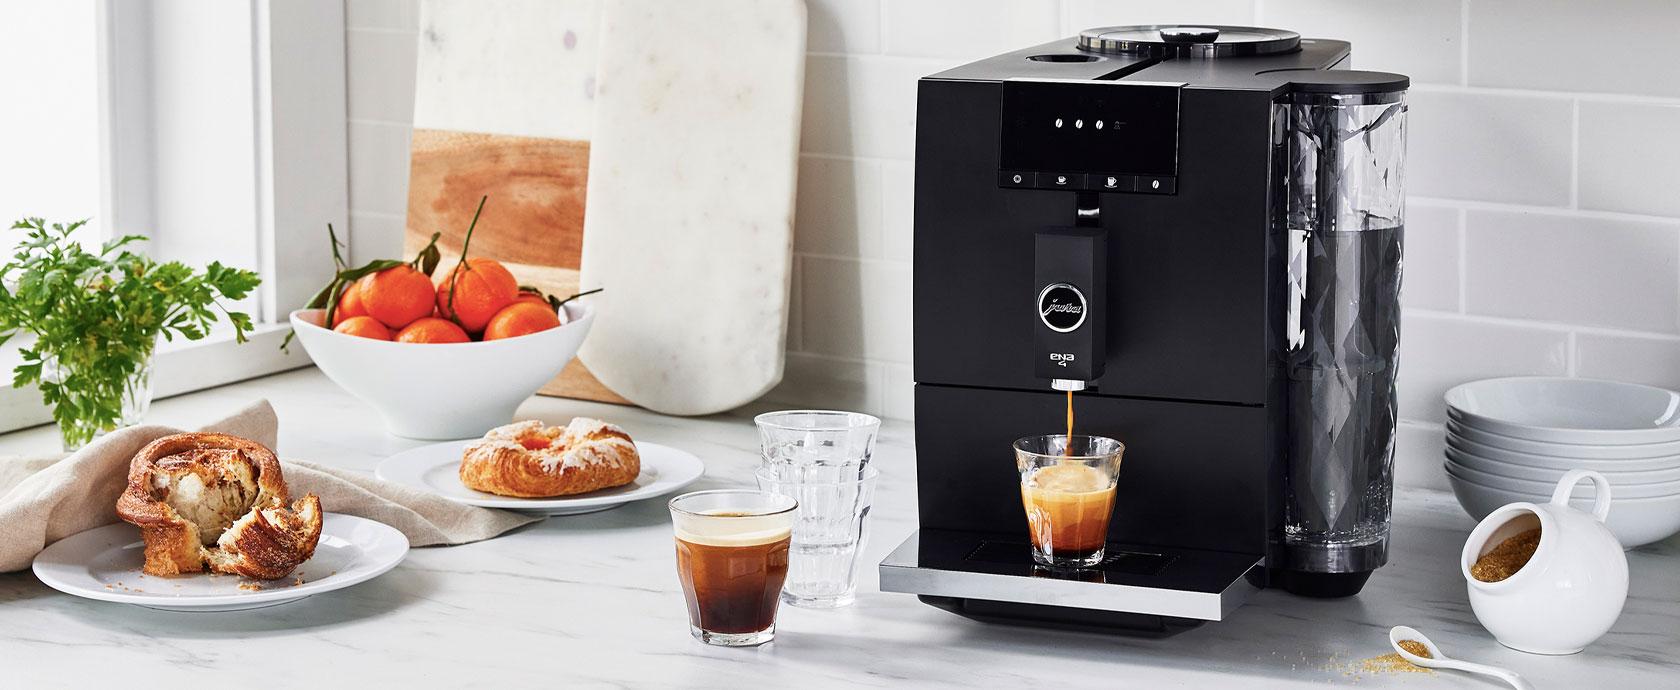 Jura Ena 4 Coffee and espresso machine exclusively at Sur La Table